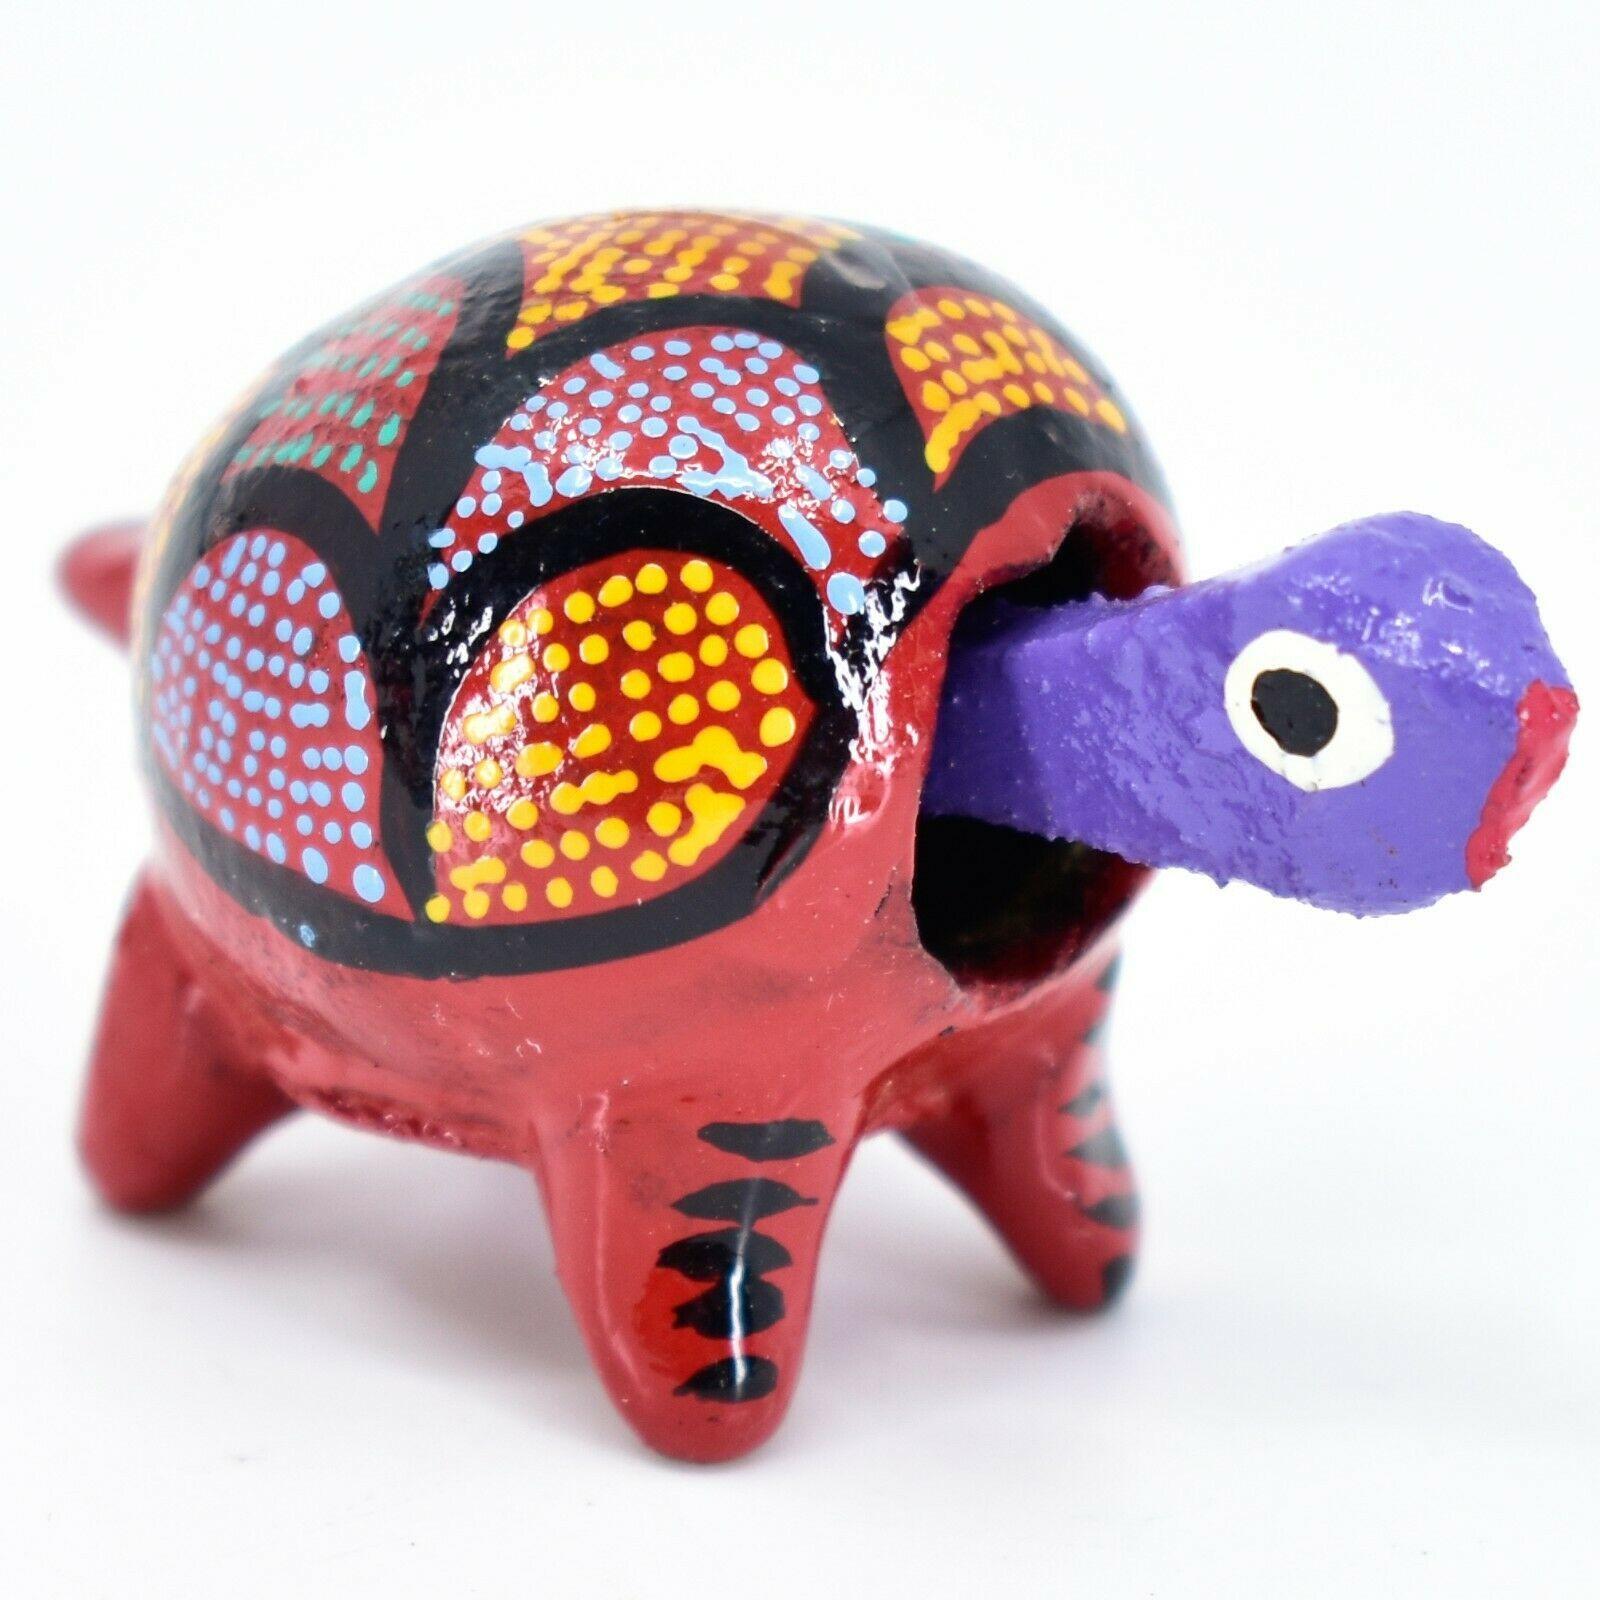 Handmade Oaxacan Alebrijes Wood Carving Folk Art Turtle Bobble Head Figurine